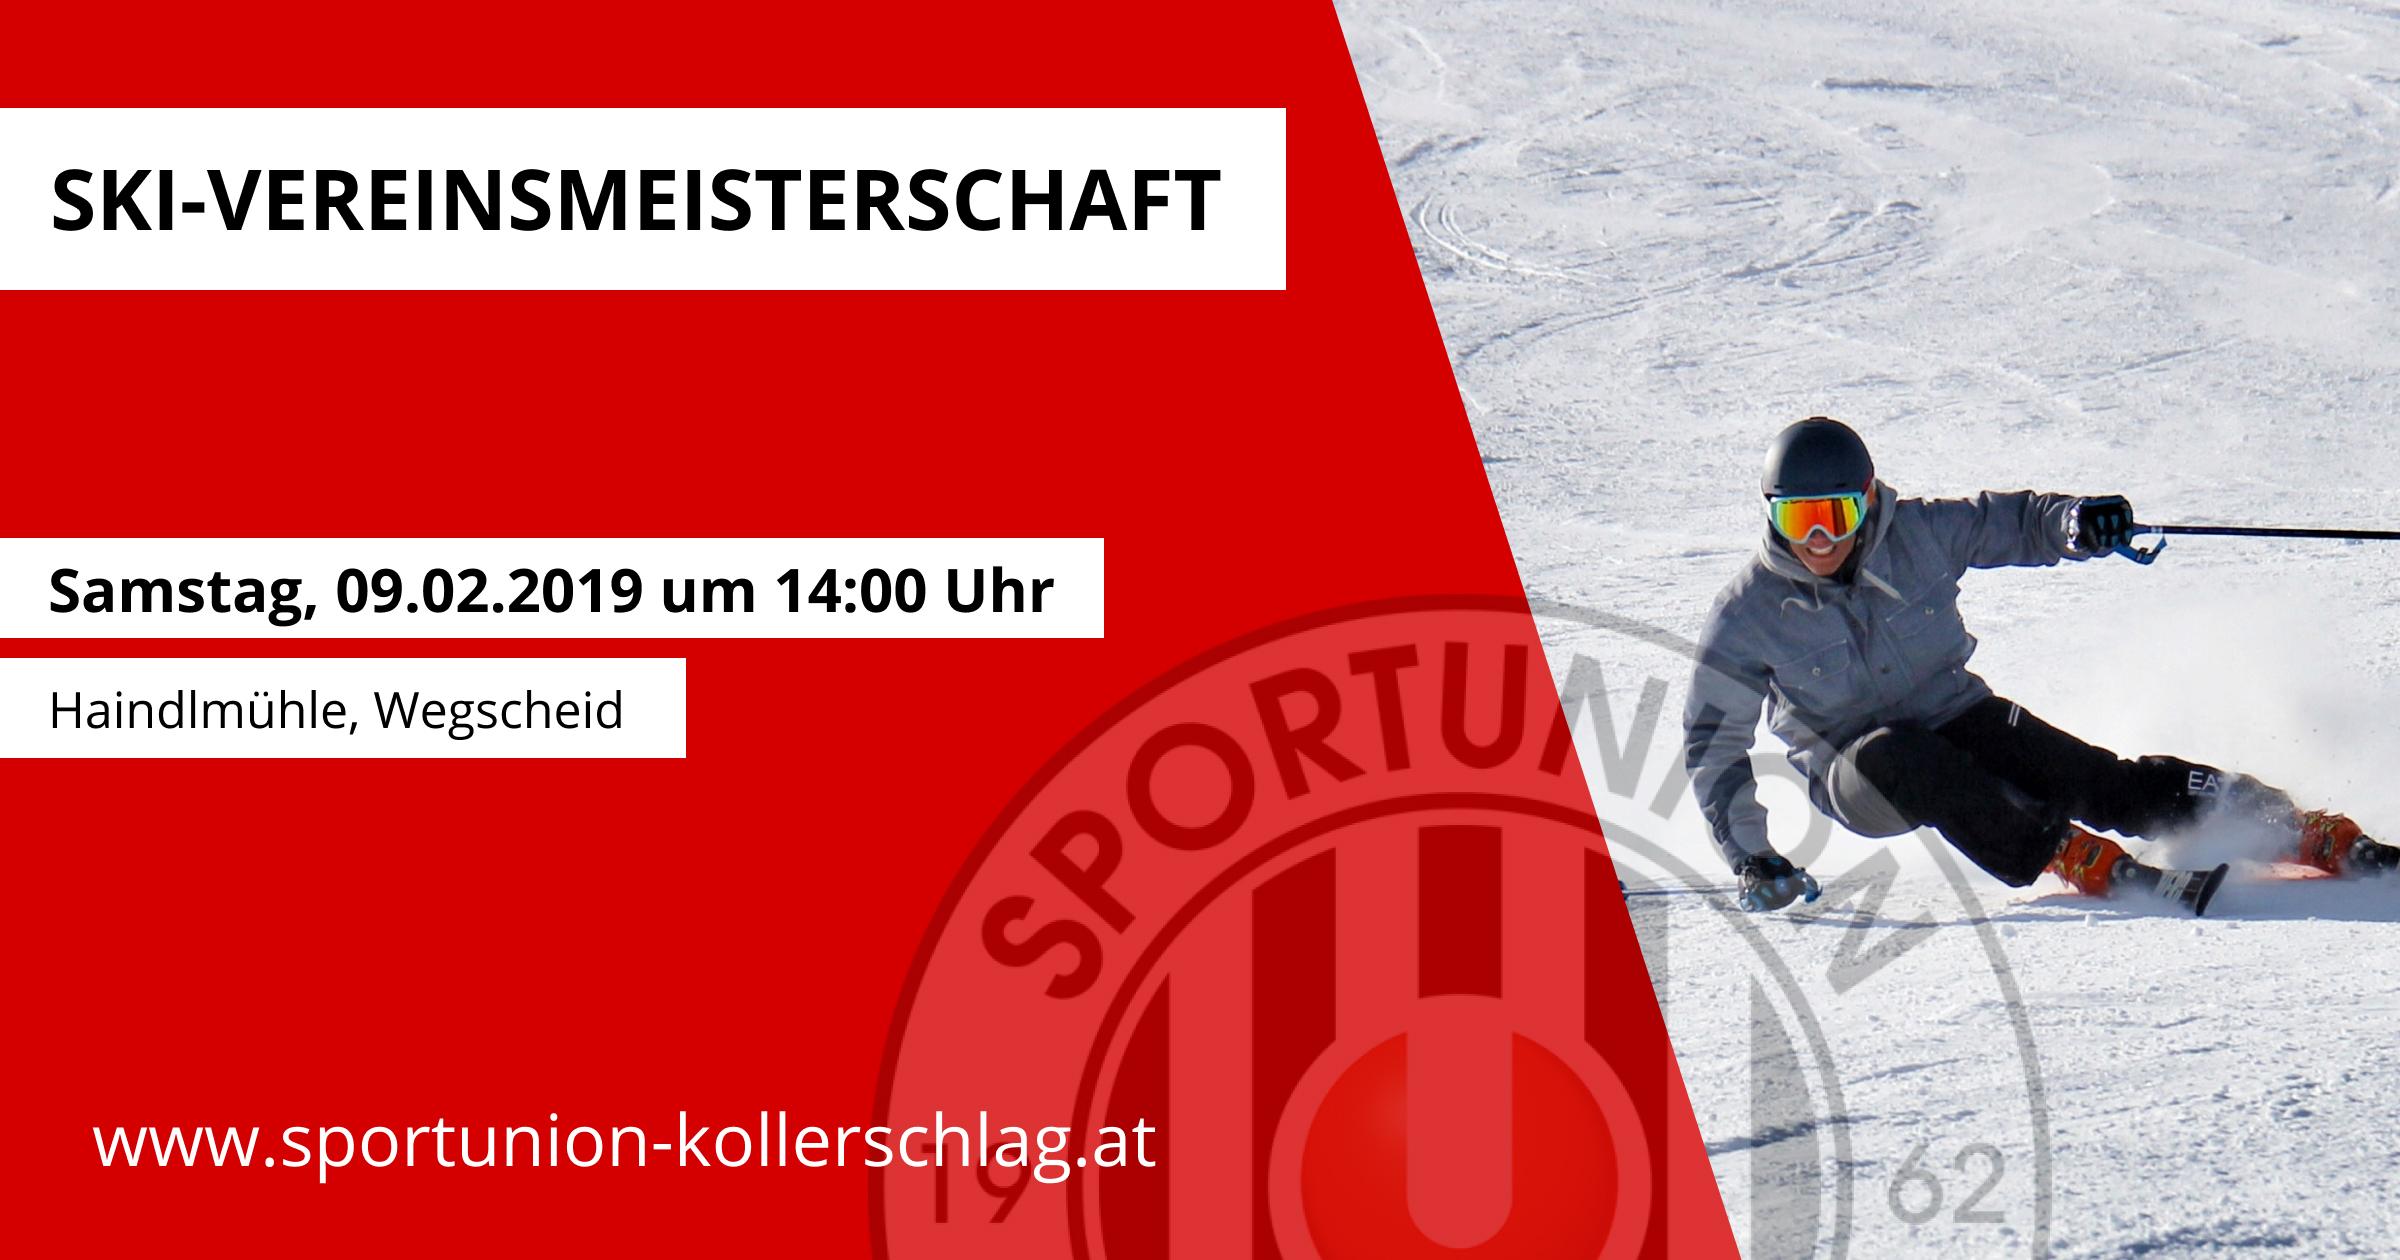 Ski-Vereinsmeisterschaft am 09. Februar 2019